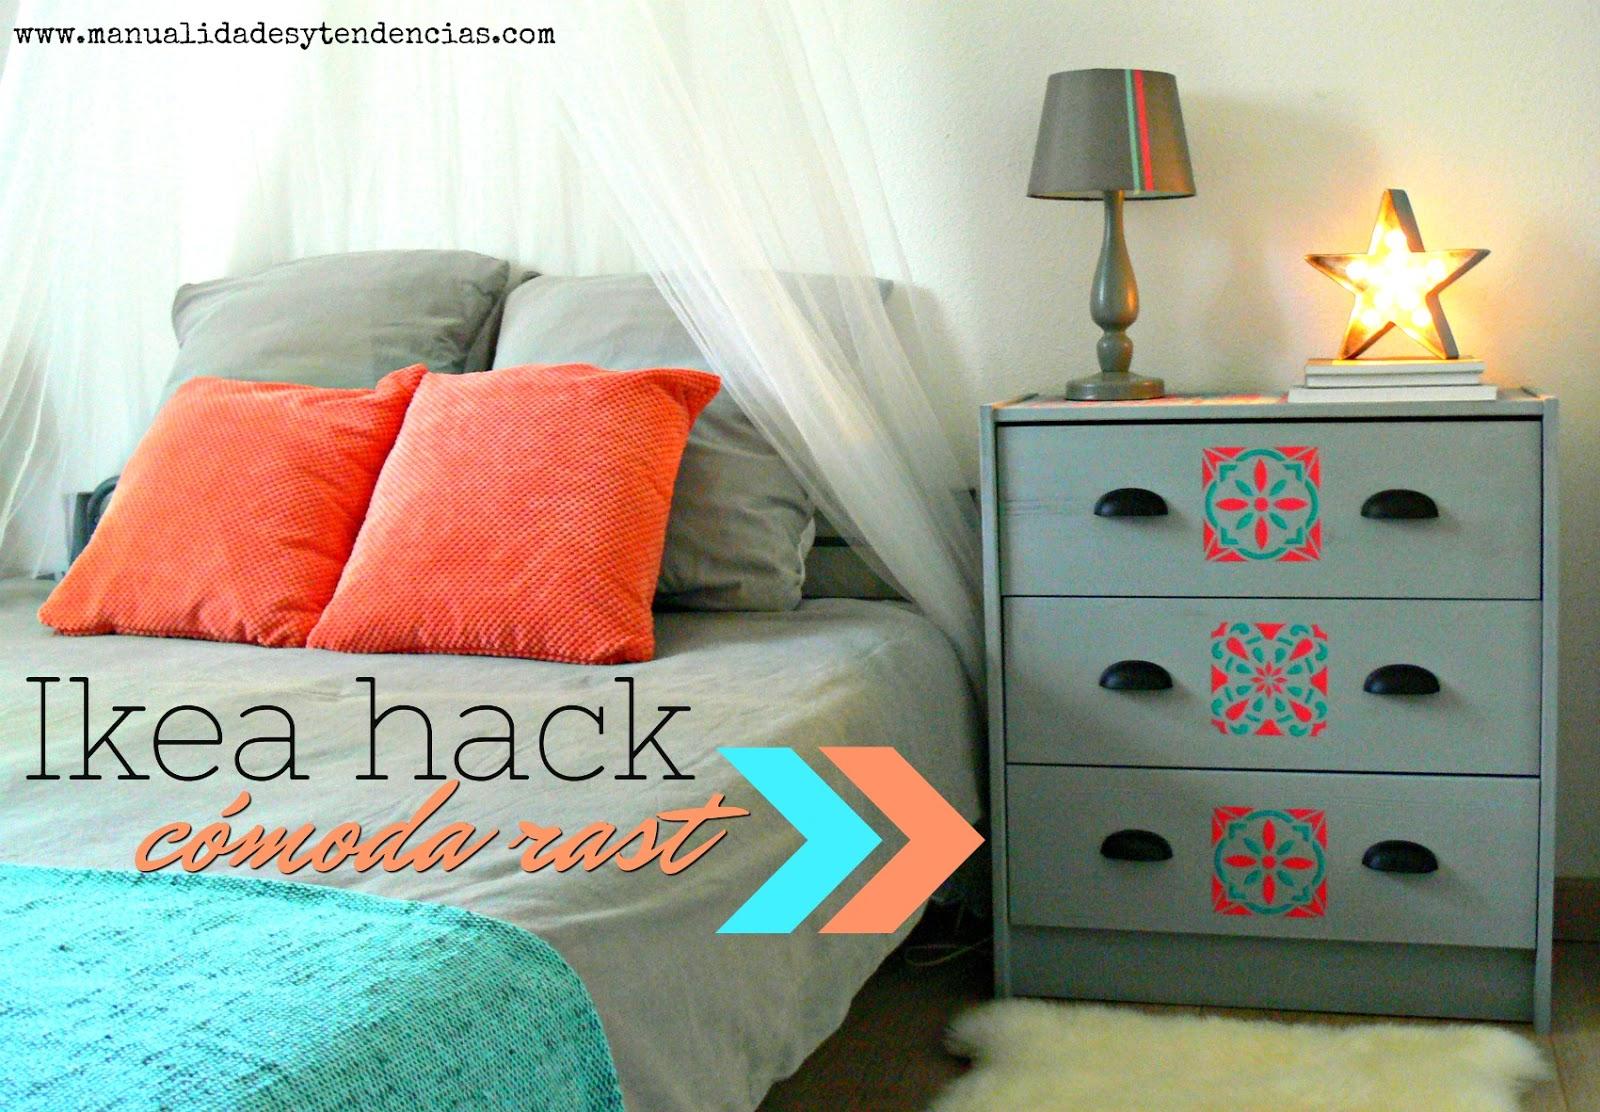 Ikea hack c moda rast handbox craft lovers comunidad for Comoda rast ikea